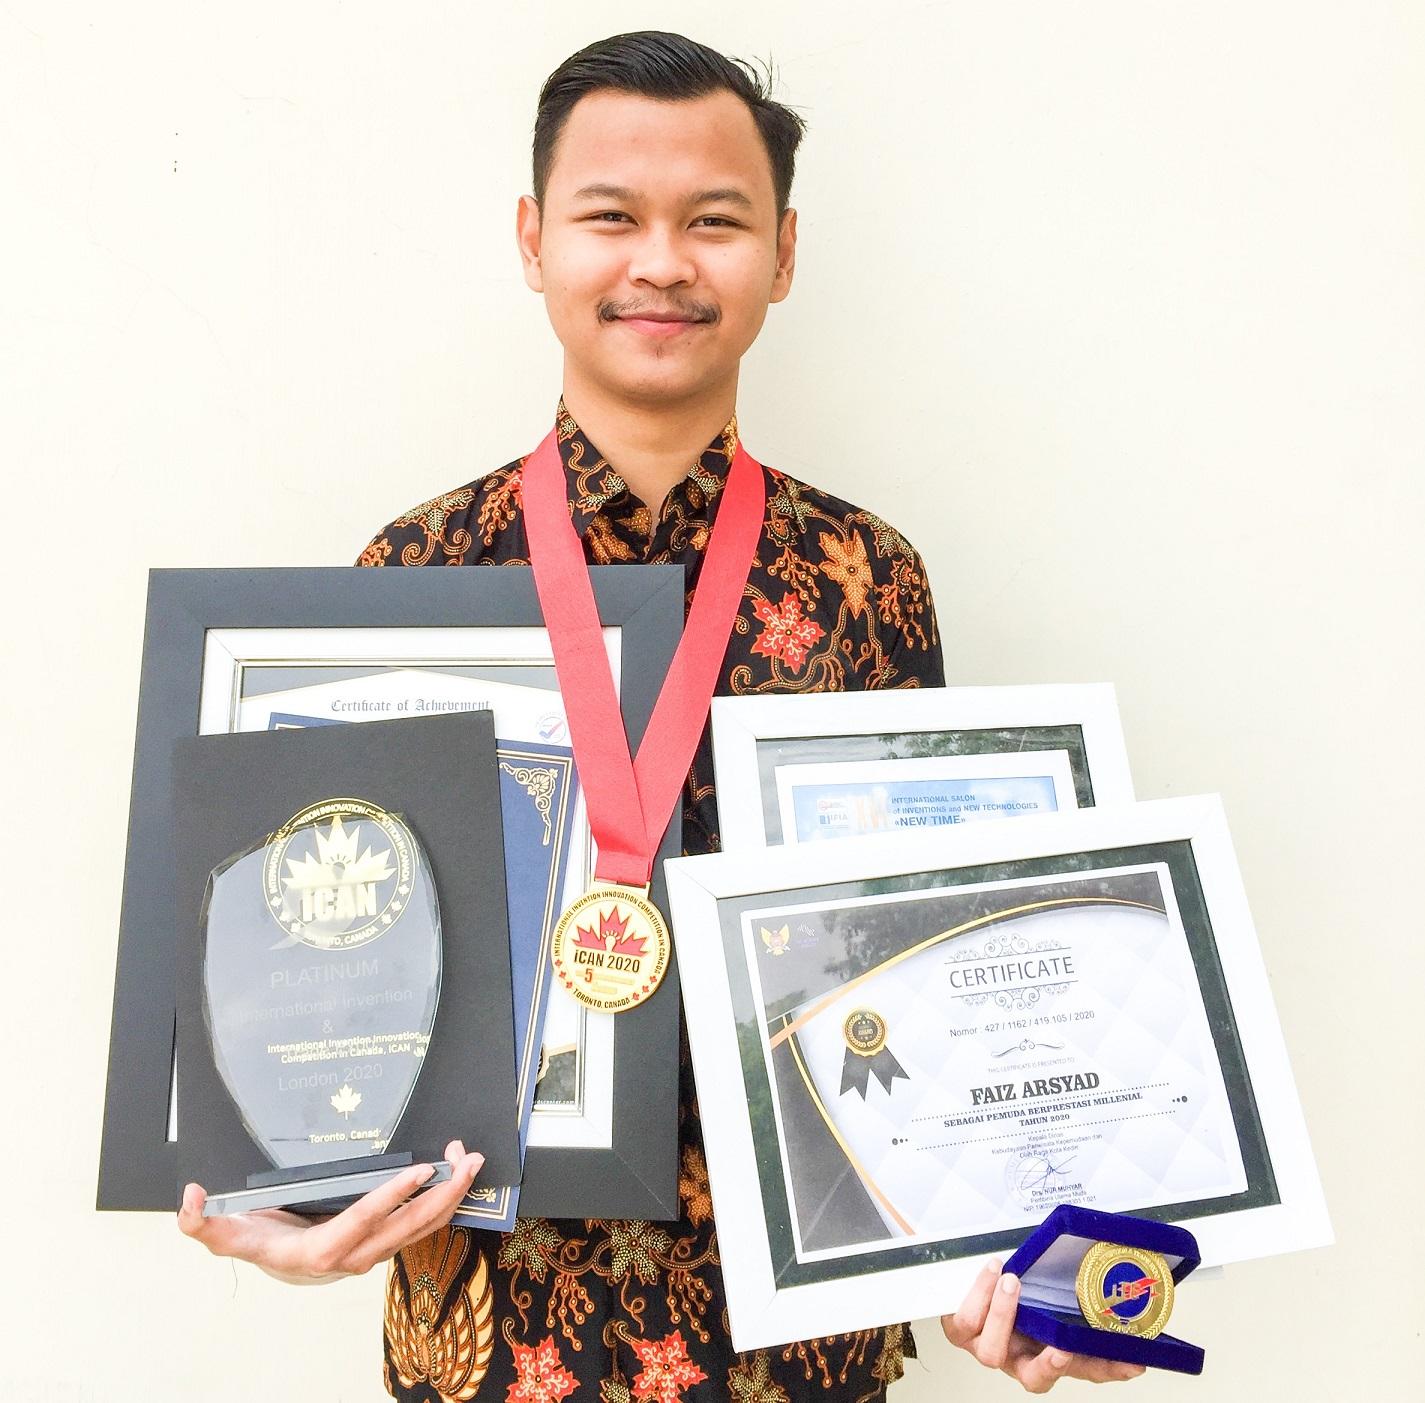 Faiz bersama piagam penghargaan hasil racikan kopi kulit mangga MASCO | Foto: Dokumentasi Pribadi